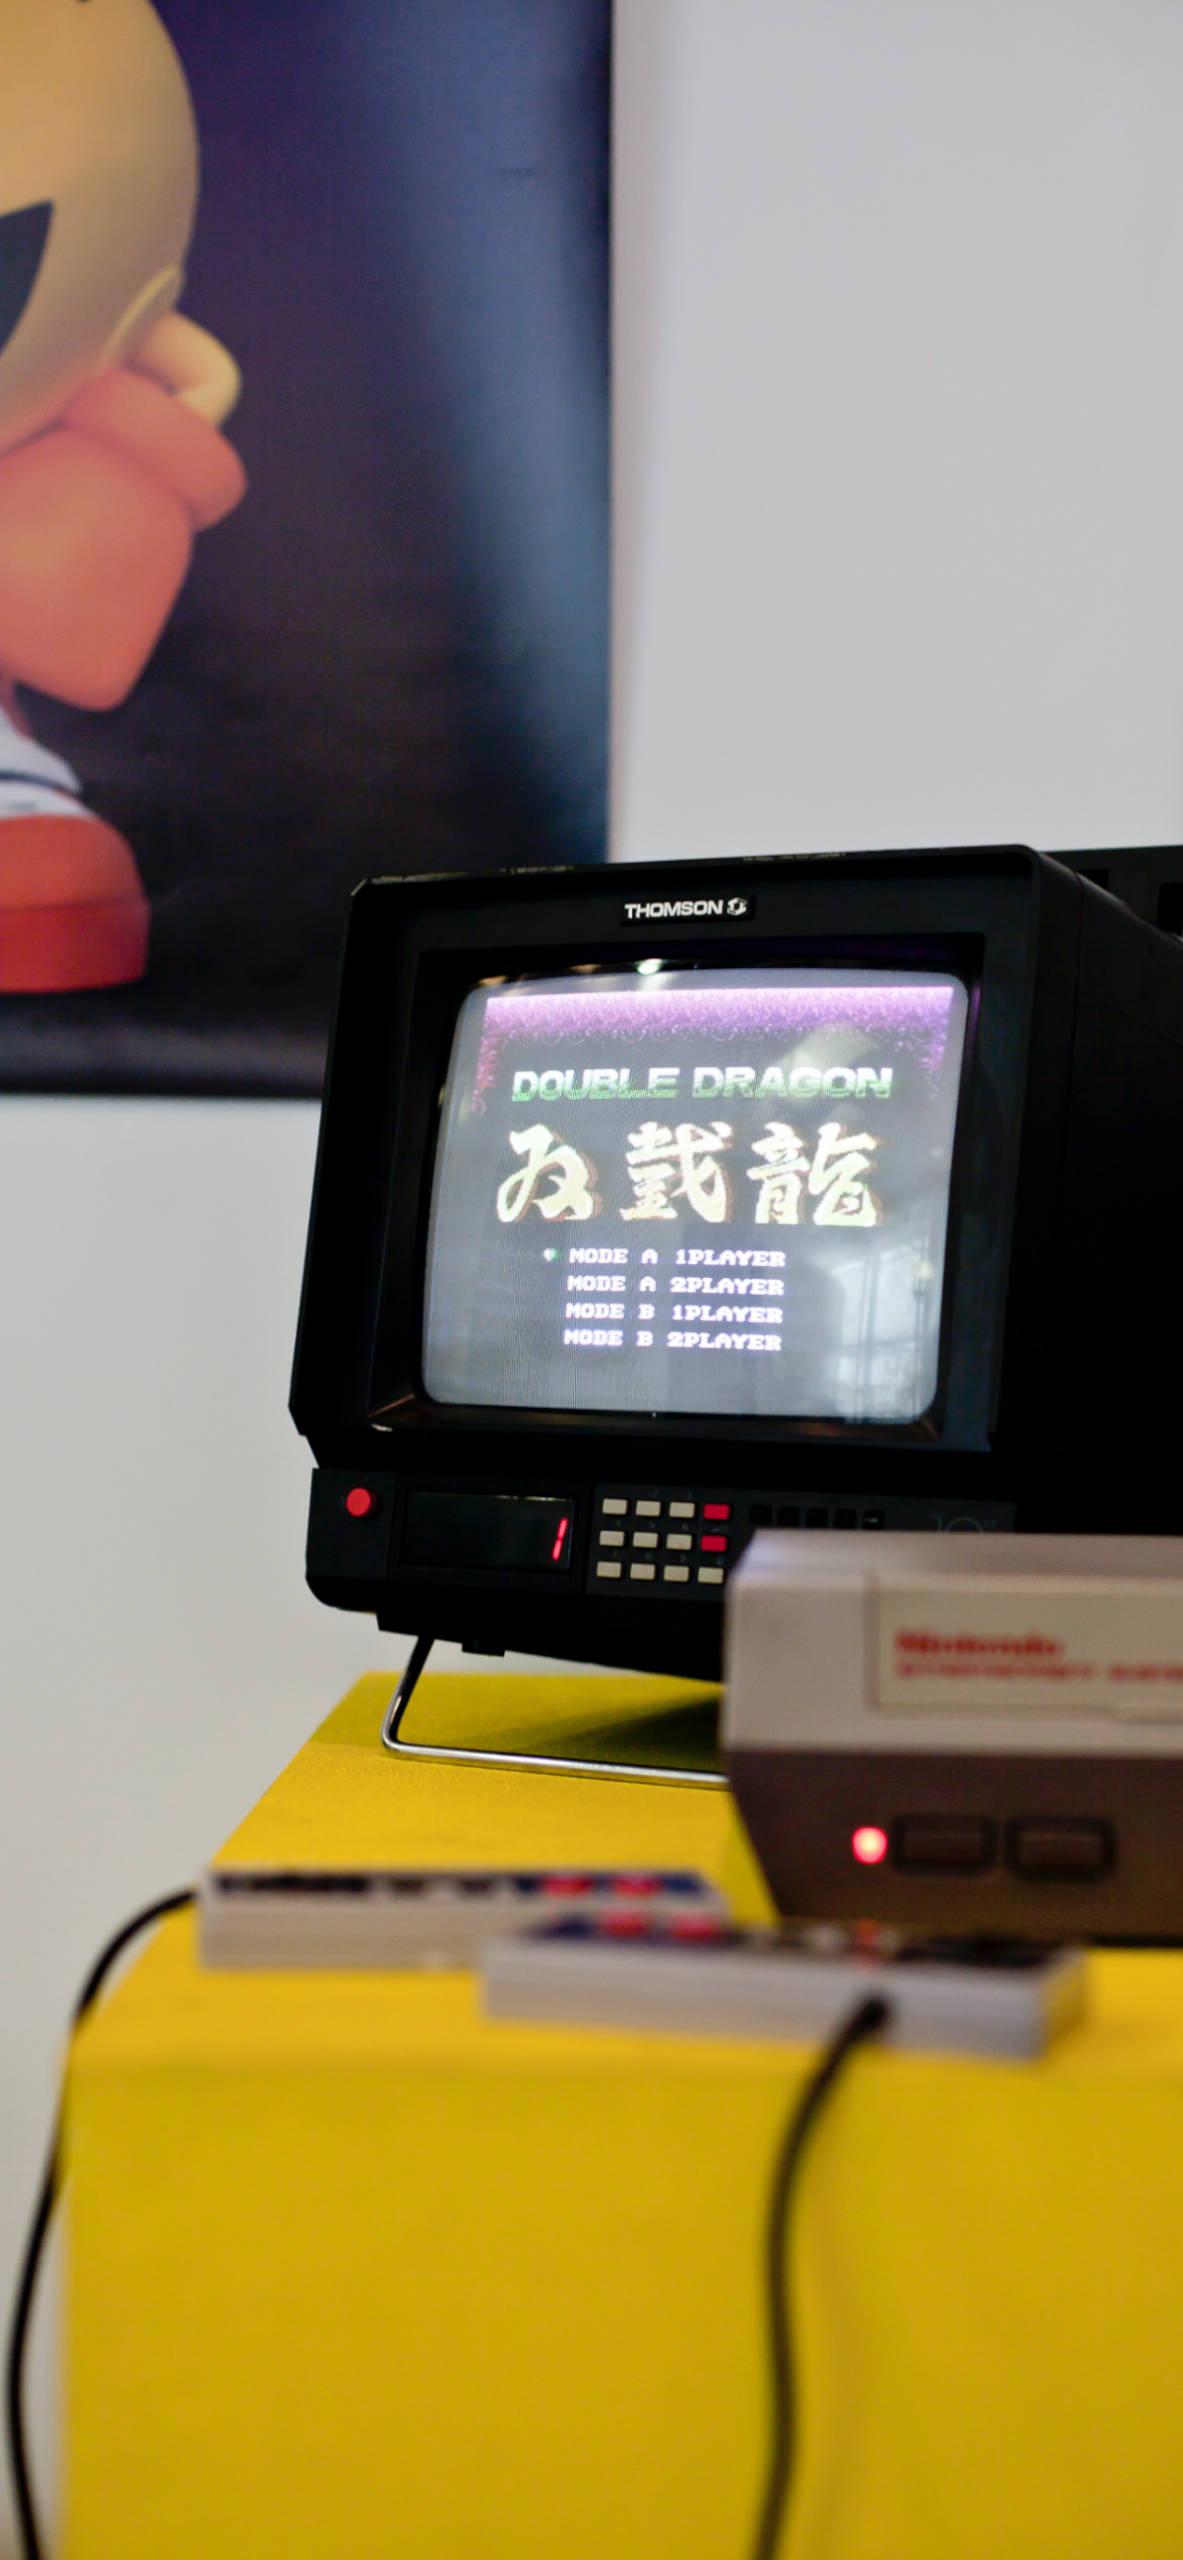 iPhone wallpapers gaming nintendo double dragon nes Nintendo